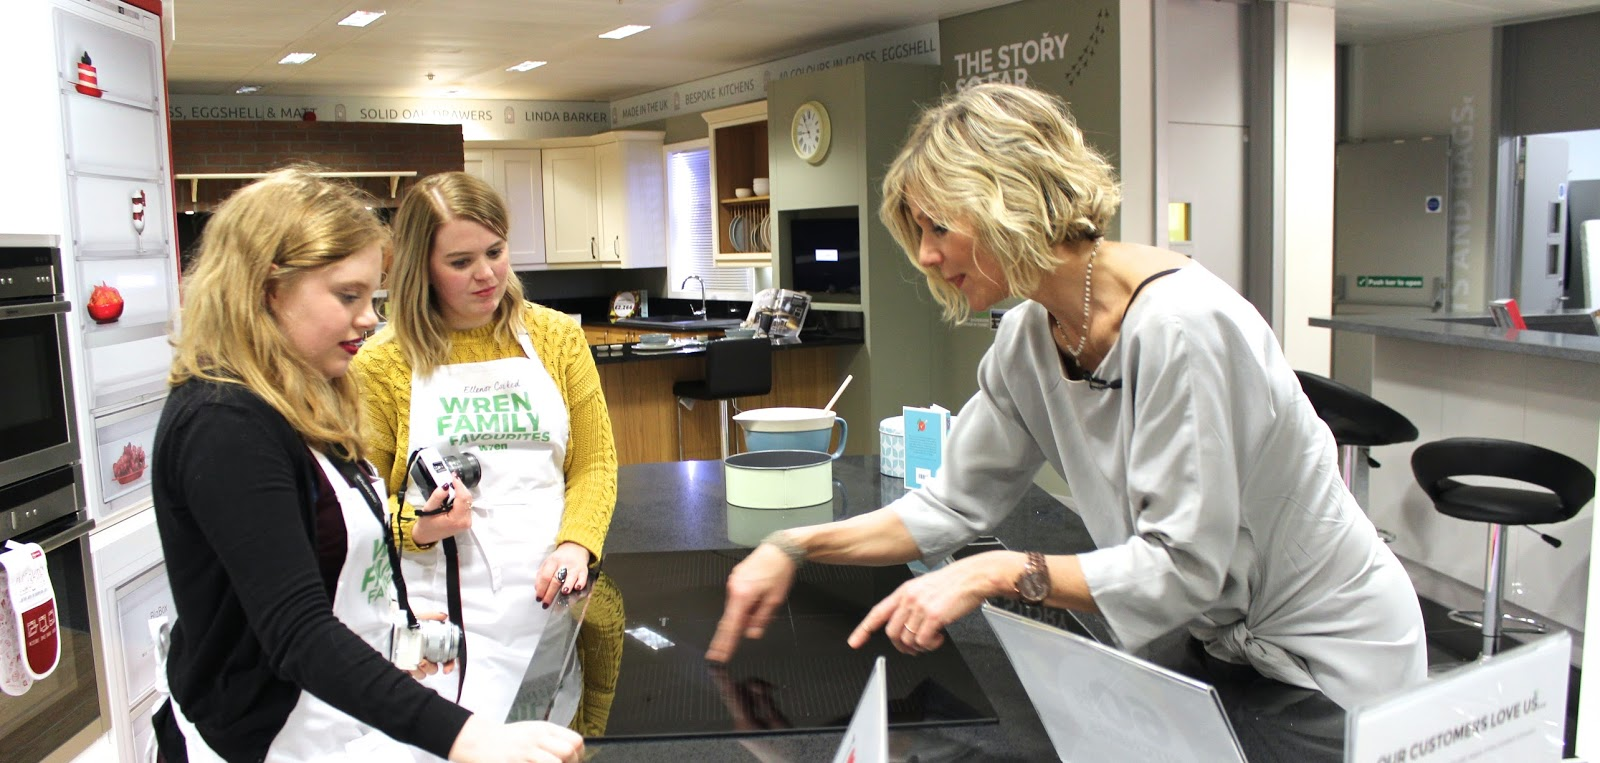 Wrenfamilyfavourites With Linda Barker Jordancourtney